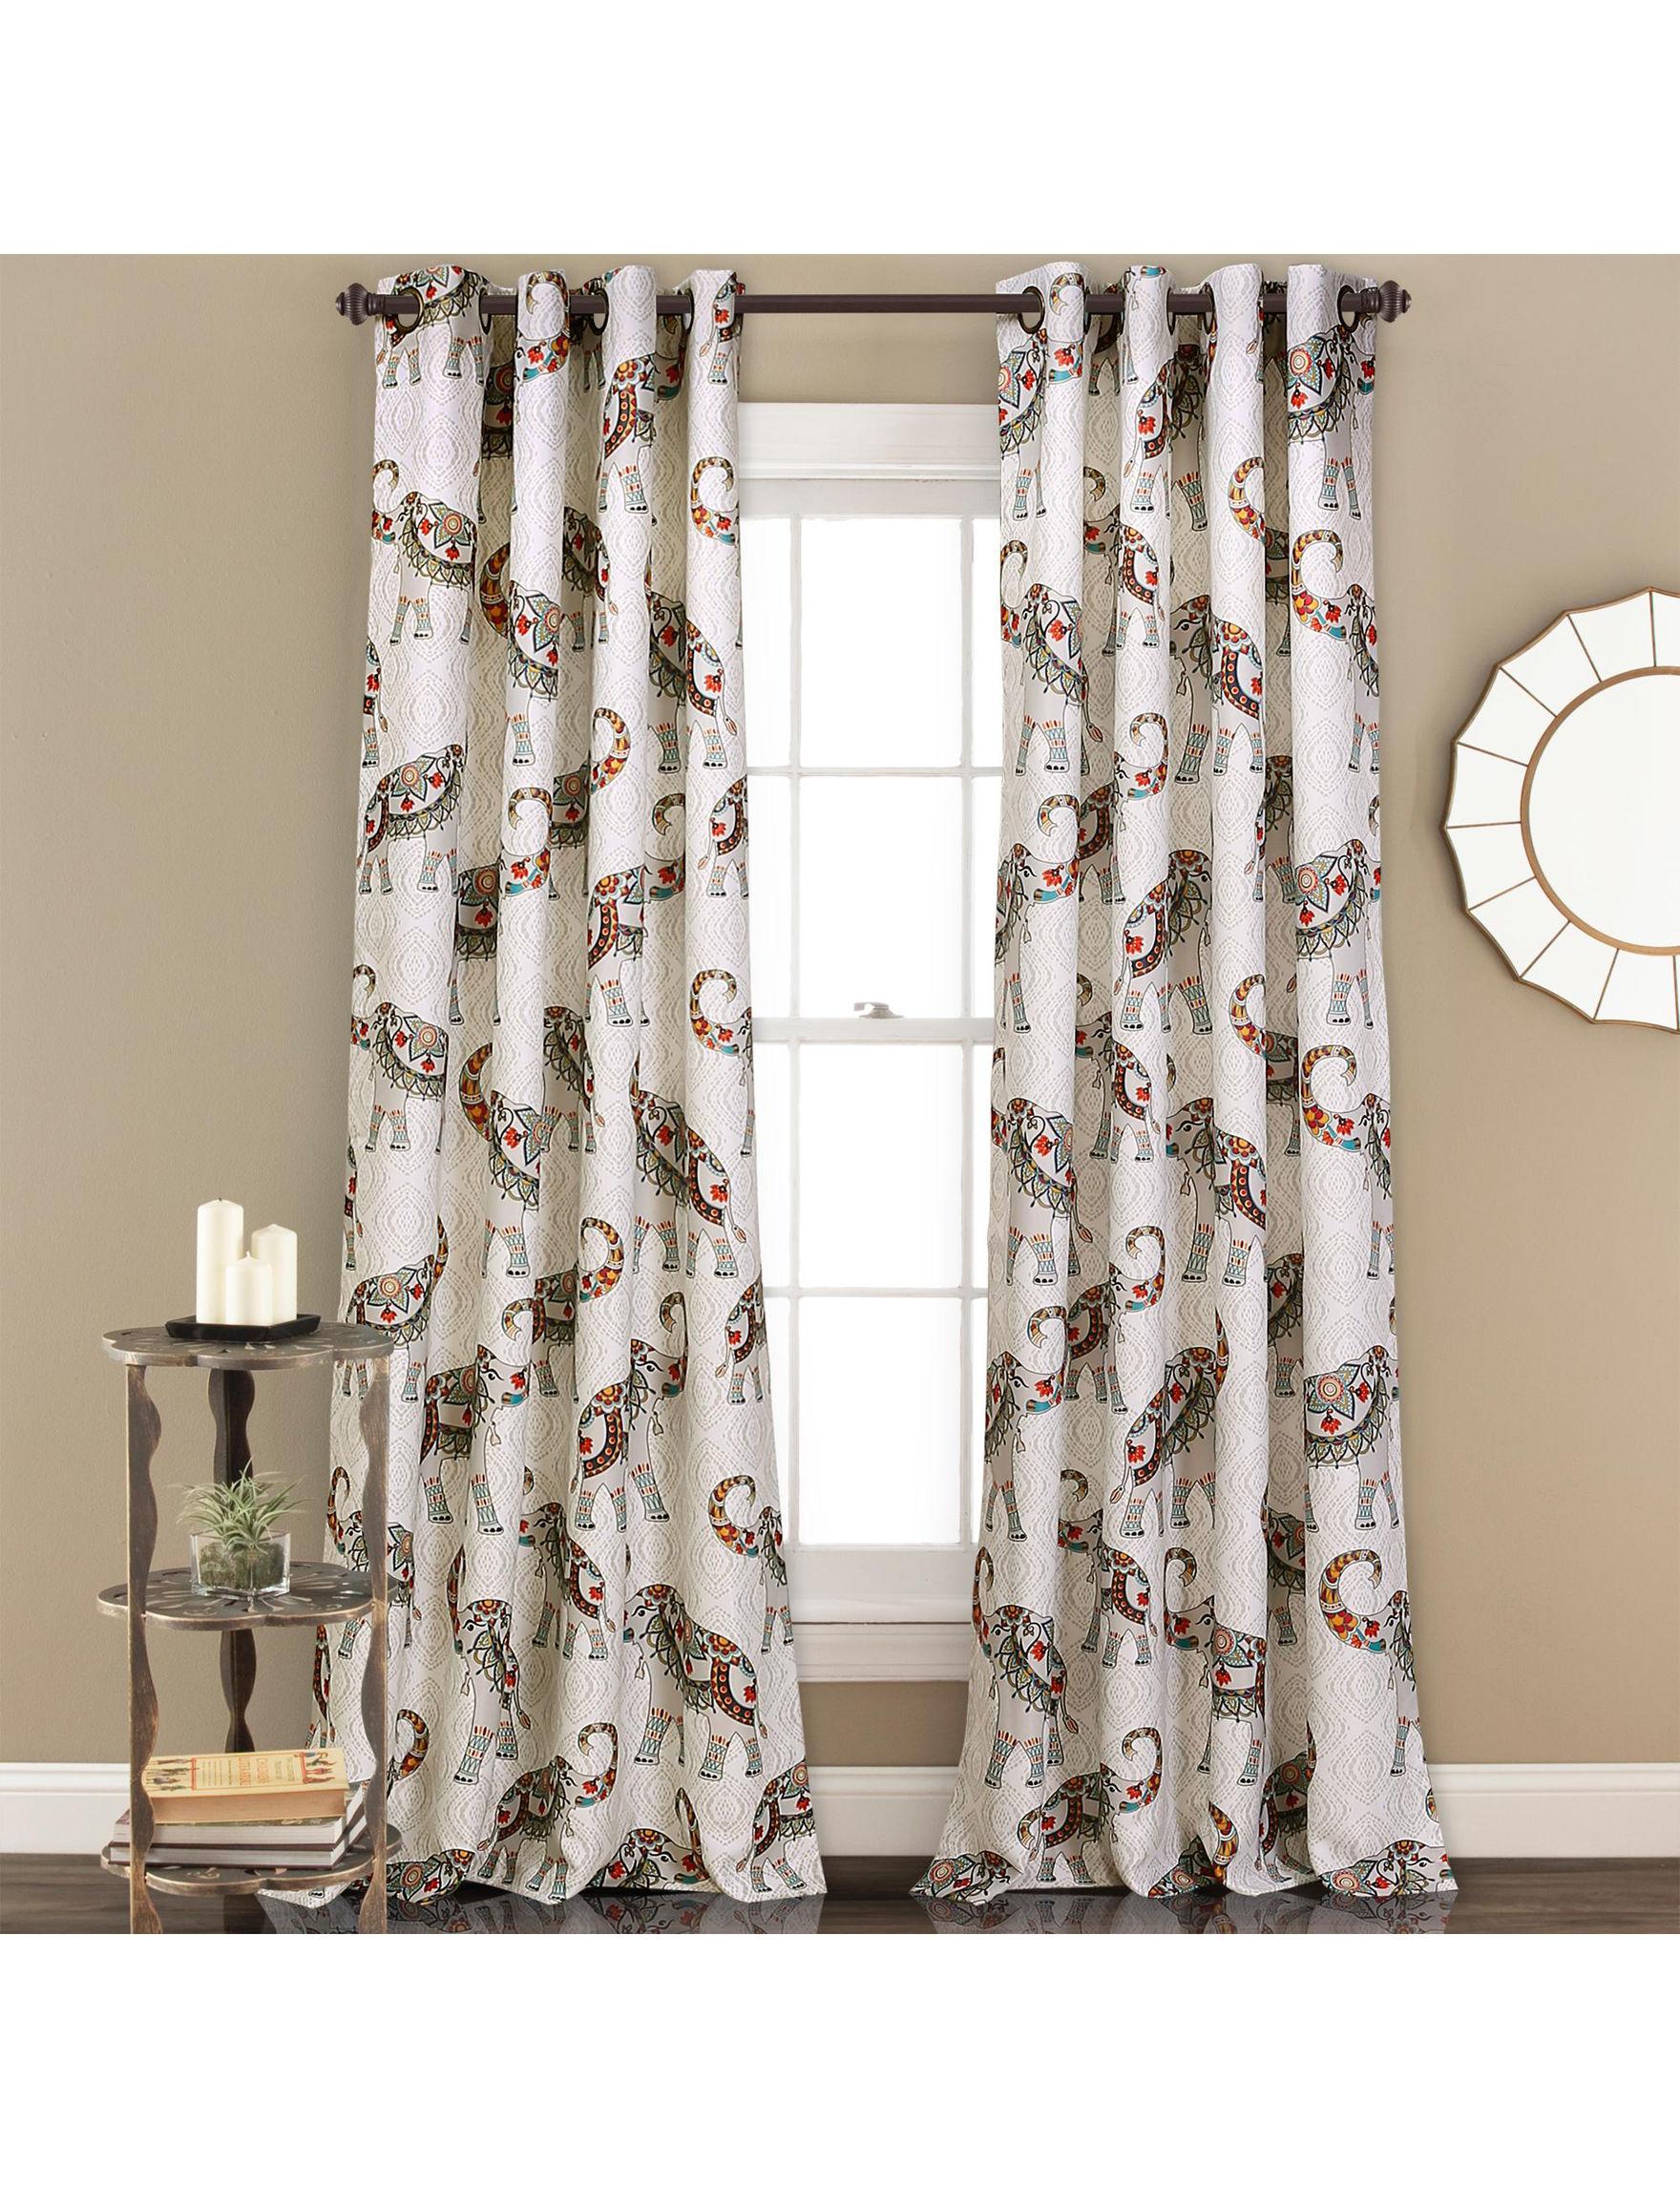 Half Moon Navy/ Turquoise Curtains & Drapes Window Treatments